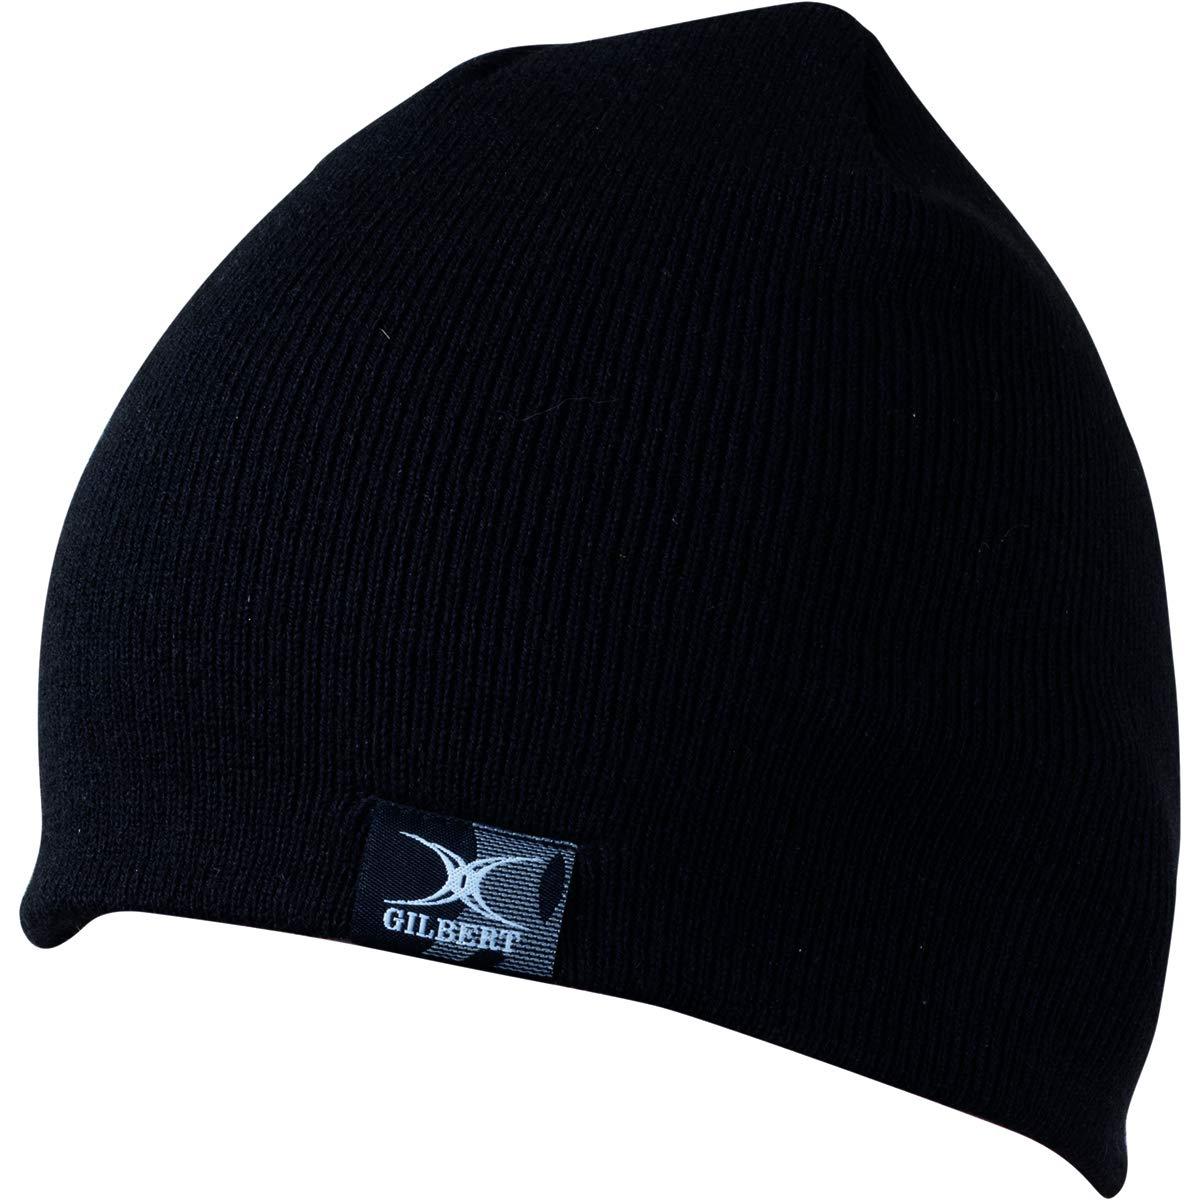 6ddf45111 Gilbert BEANIE HAT - BLACK: Amazon.co.uk: Sports & Outdoors